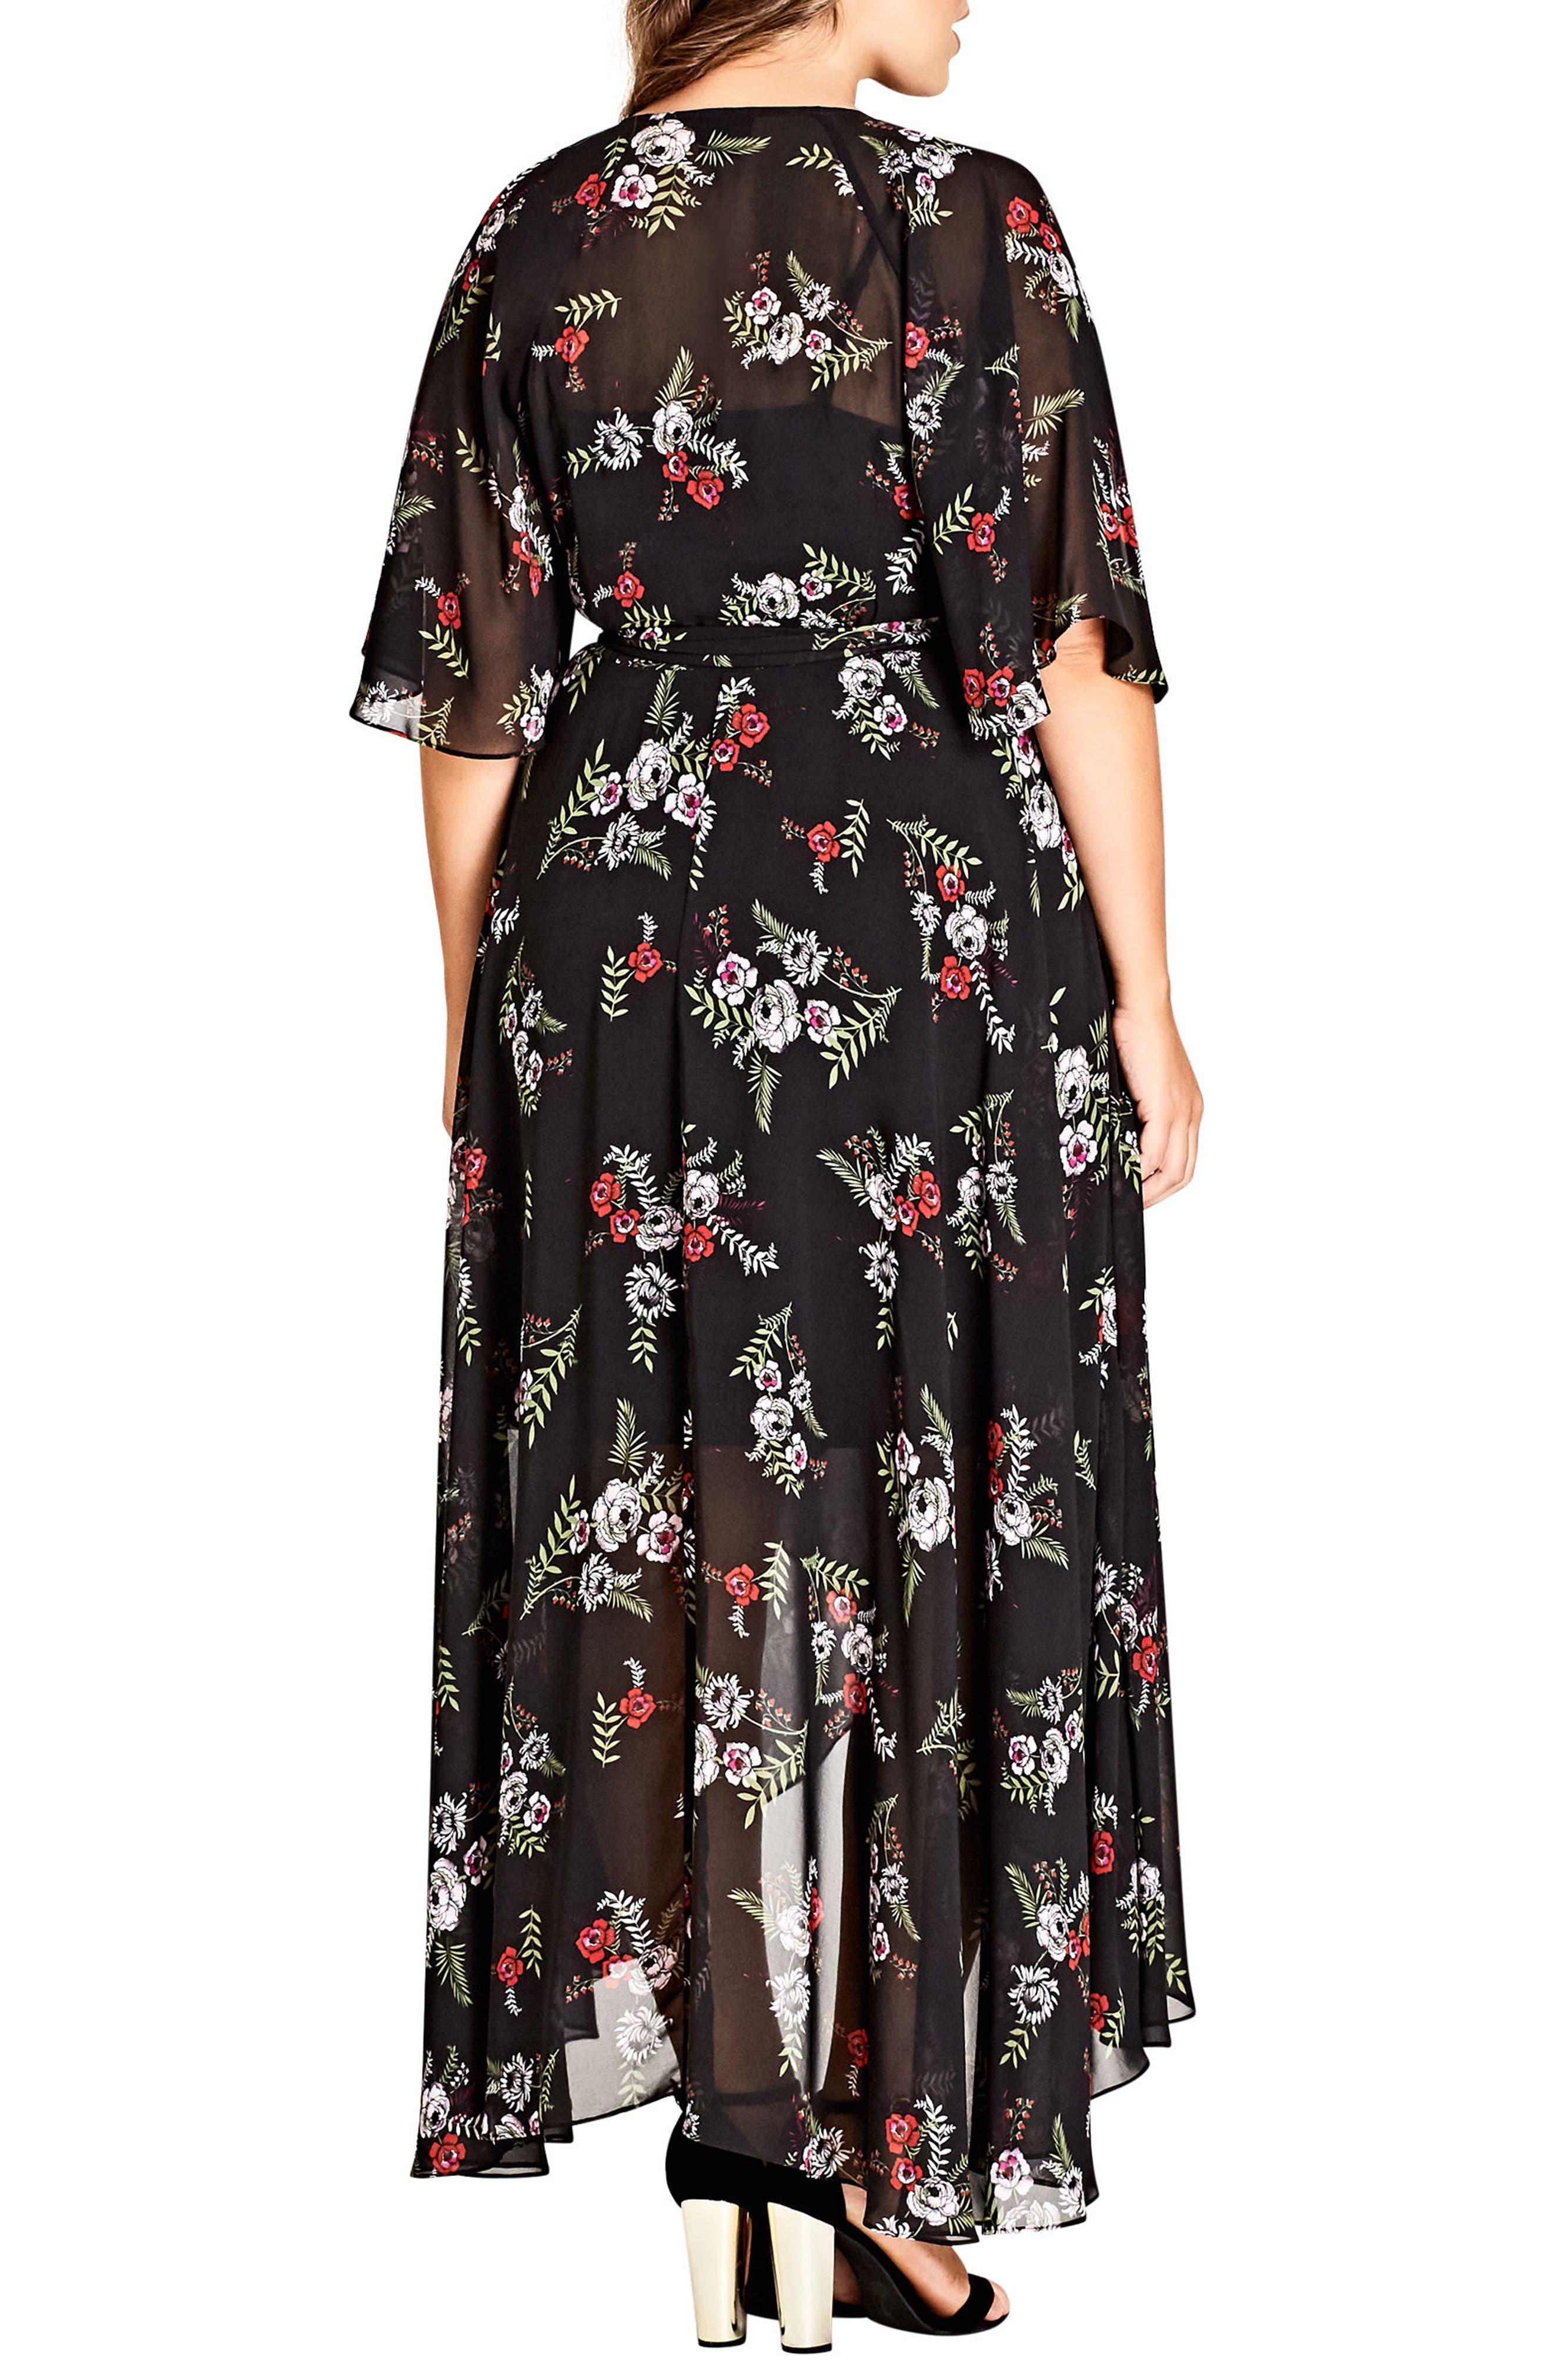 Floral Agave Wrap Dress,                             Alternate thumbnail 2, color,                             Agave Floral